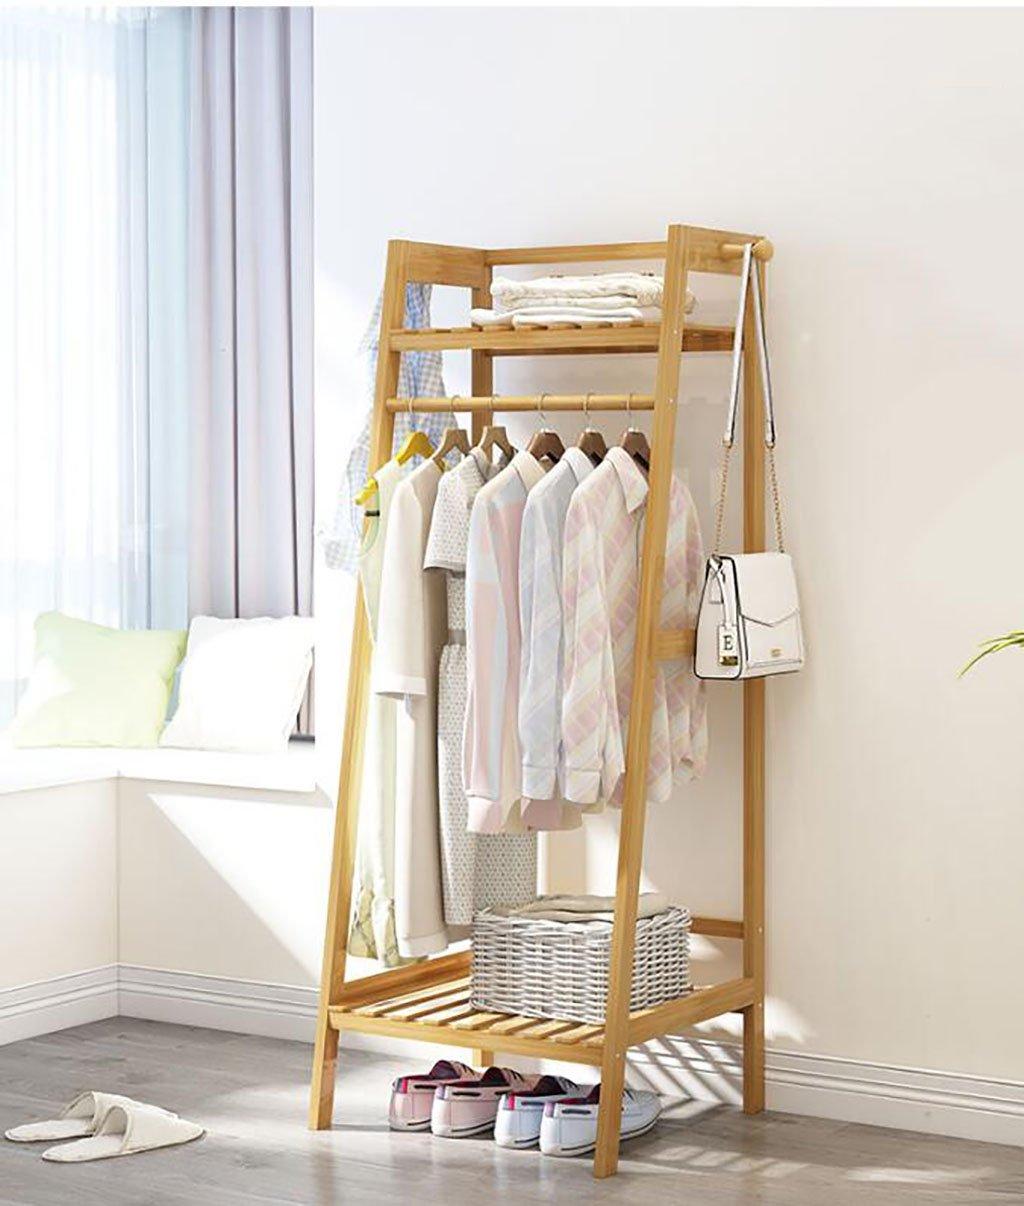 1405040cm Simple Coat Rack Solid Wood Bedroom Hanger Floor Rack Storage Rack Simple Modern Clothes Rack Shelf (Size   140  50  40cm)